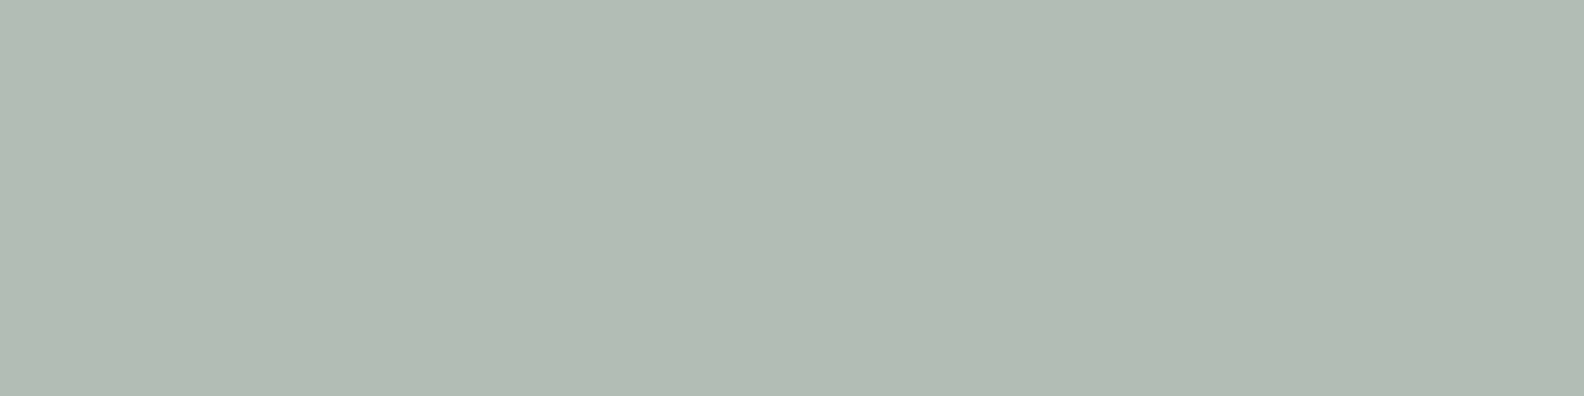 1584x396 Ash Grey Solid Color Background